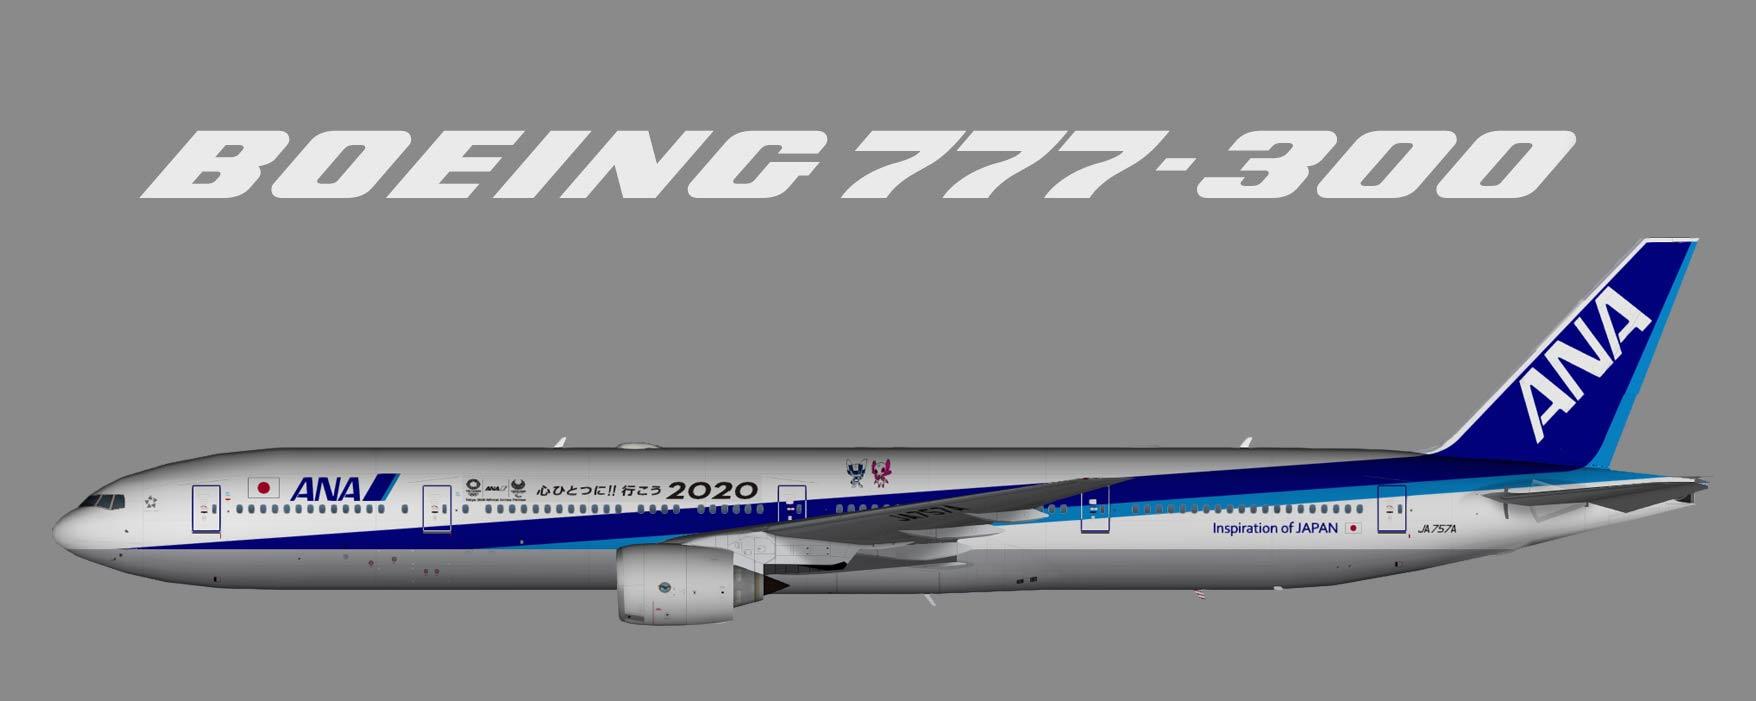 All Nippon AIrways (ANA) Boeing 777-300